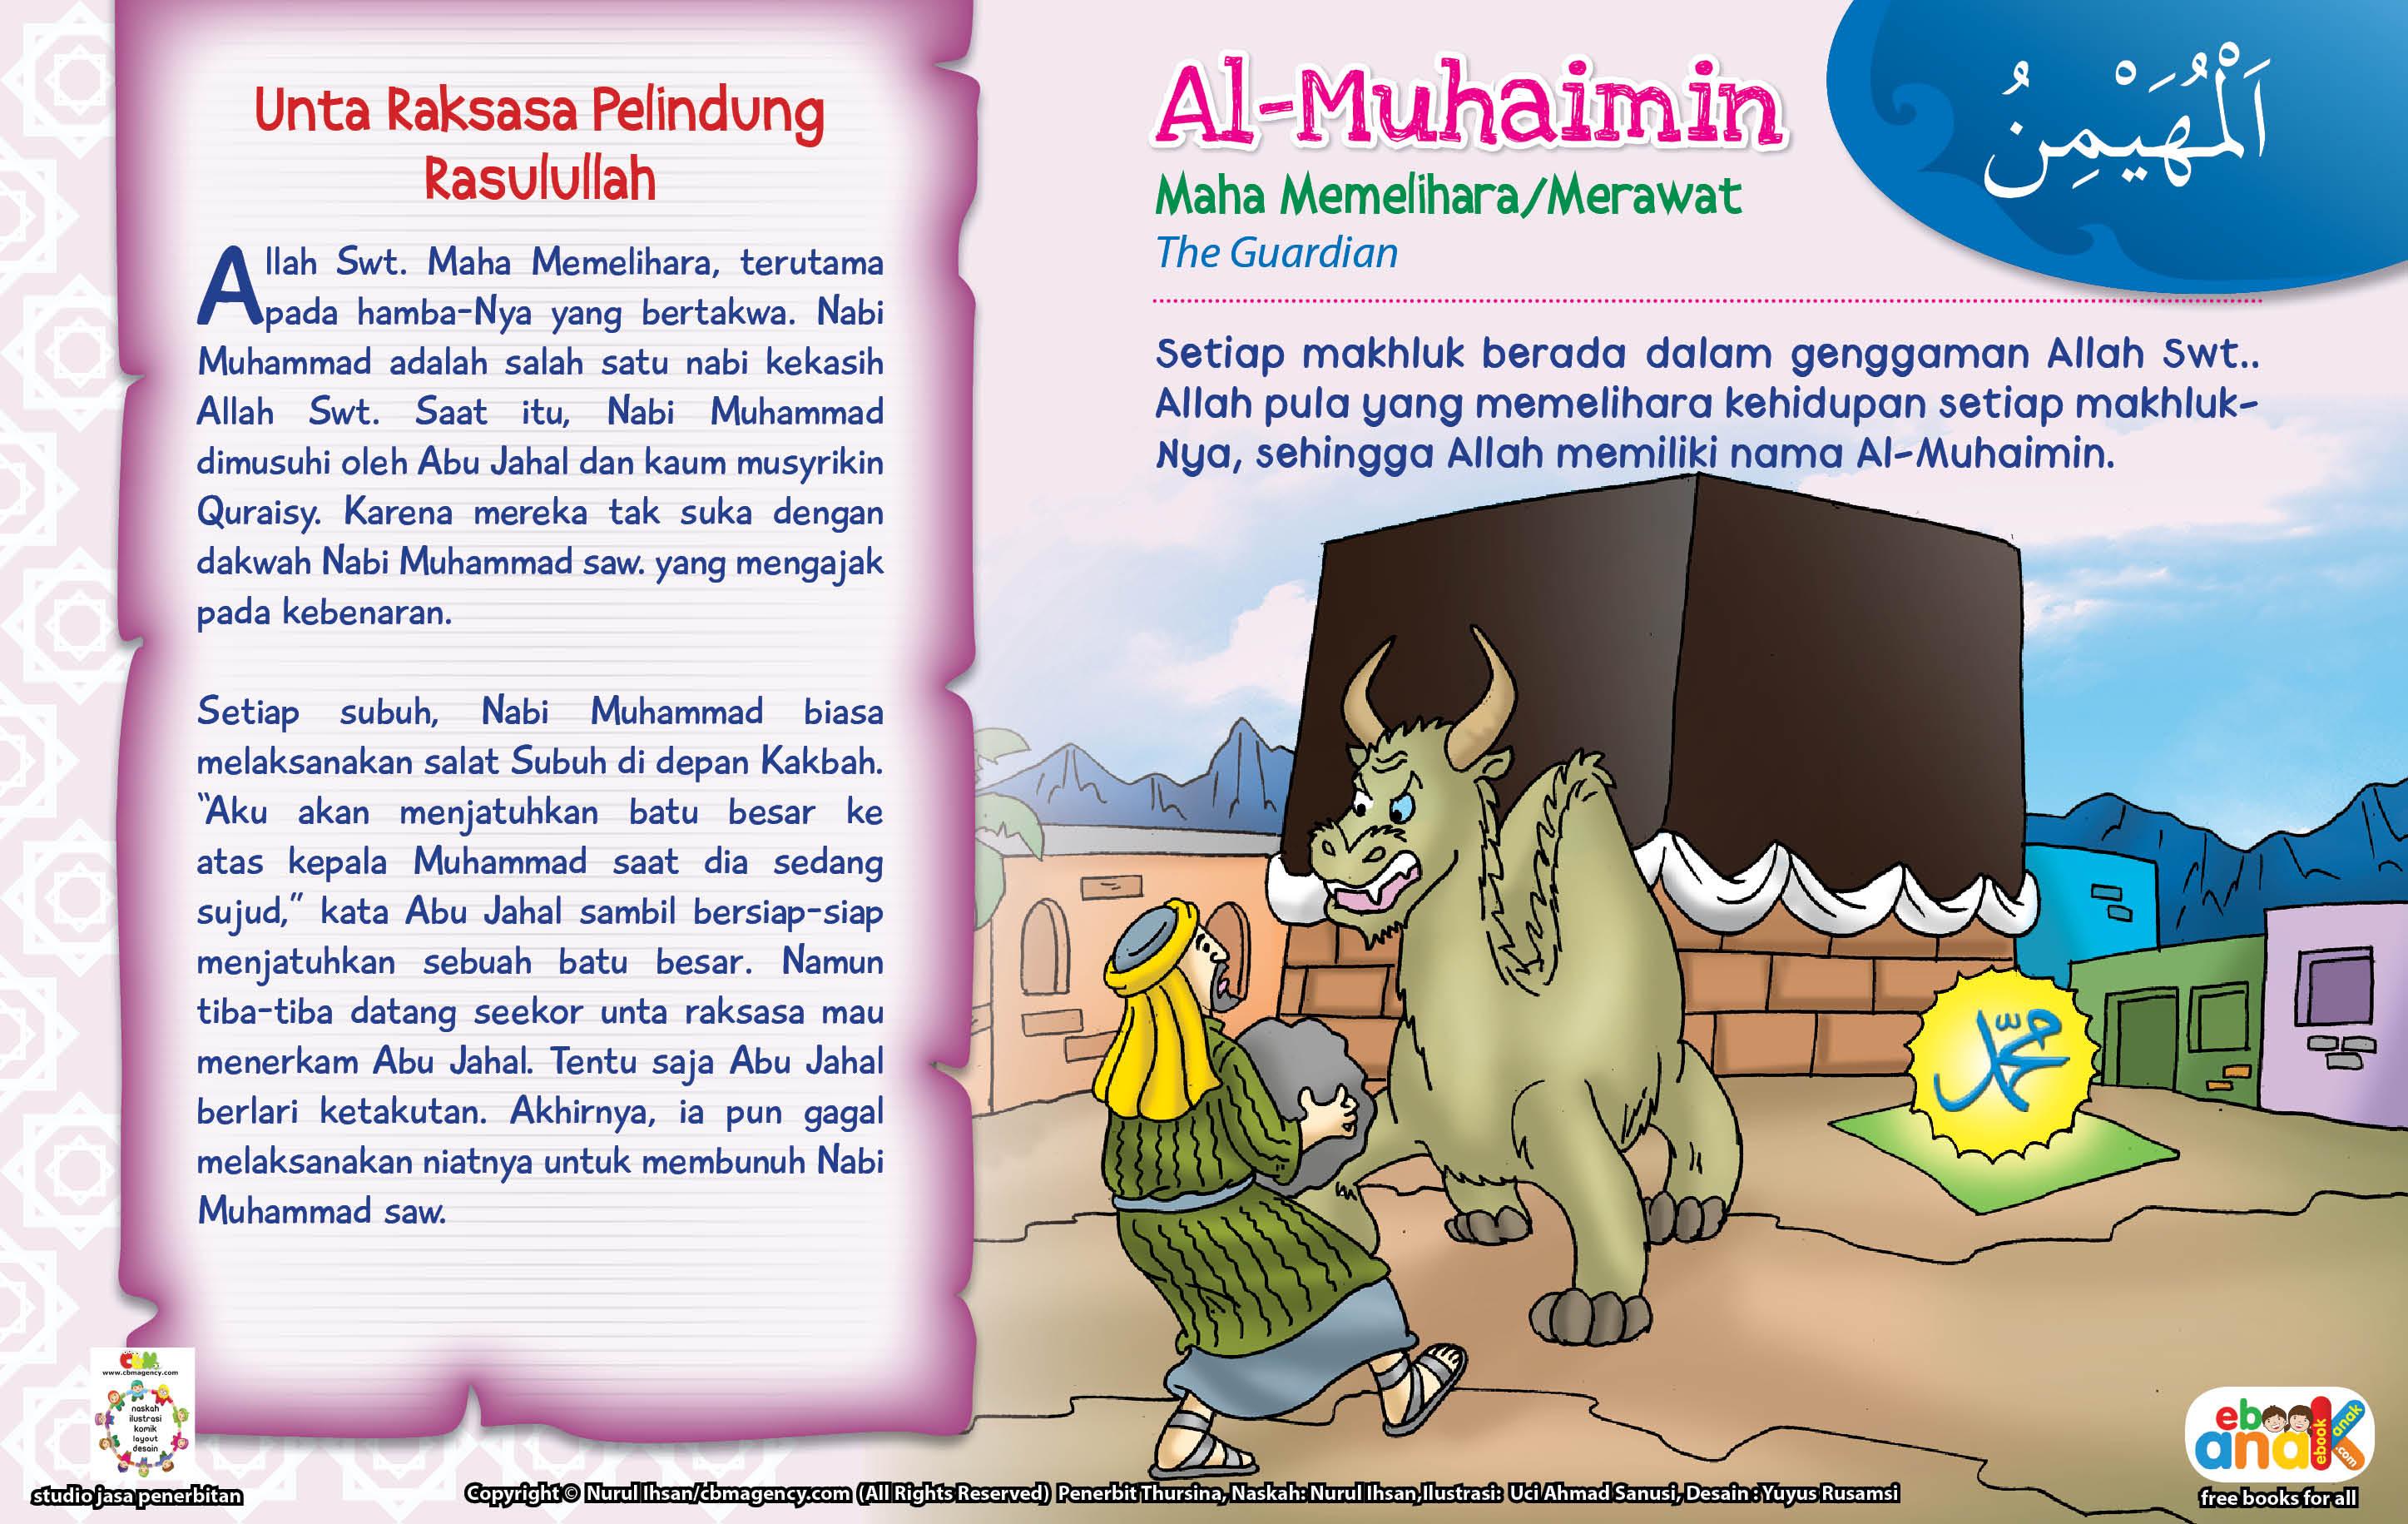 sifat al- muhaimin